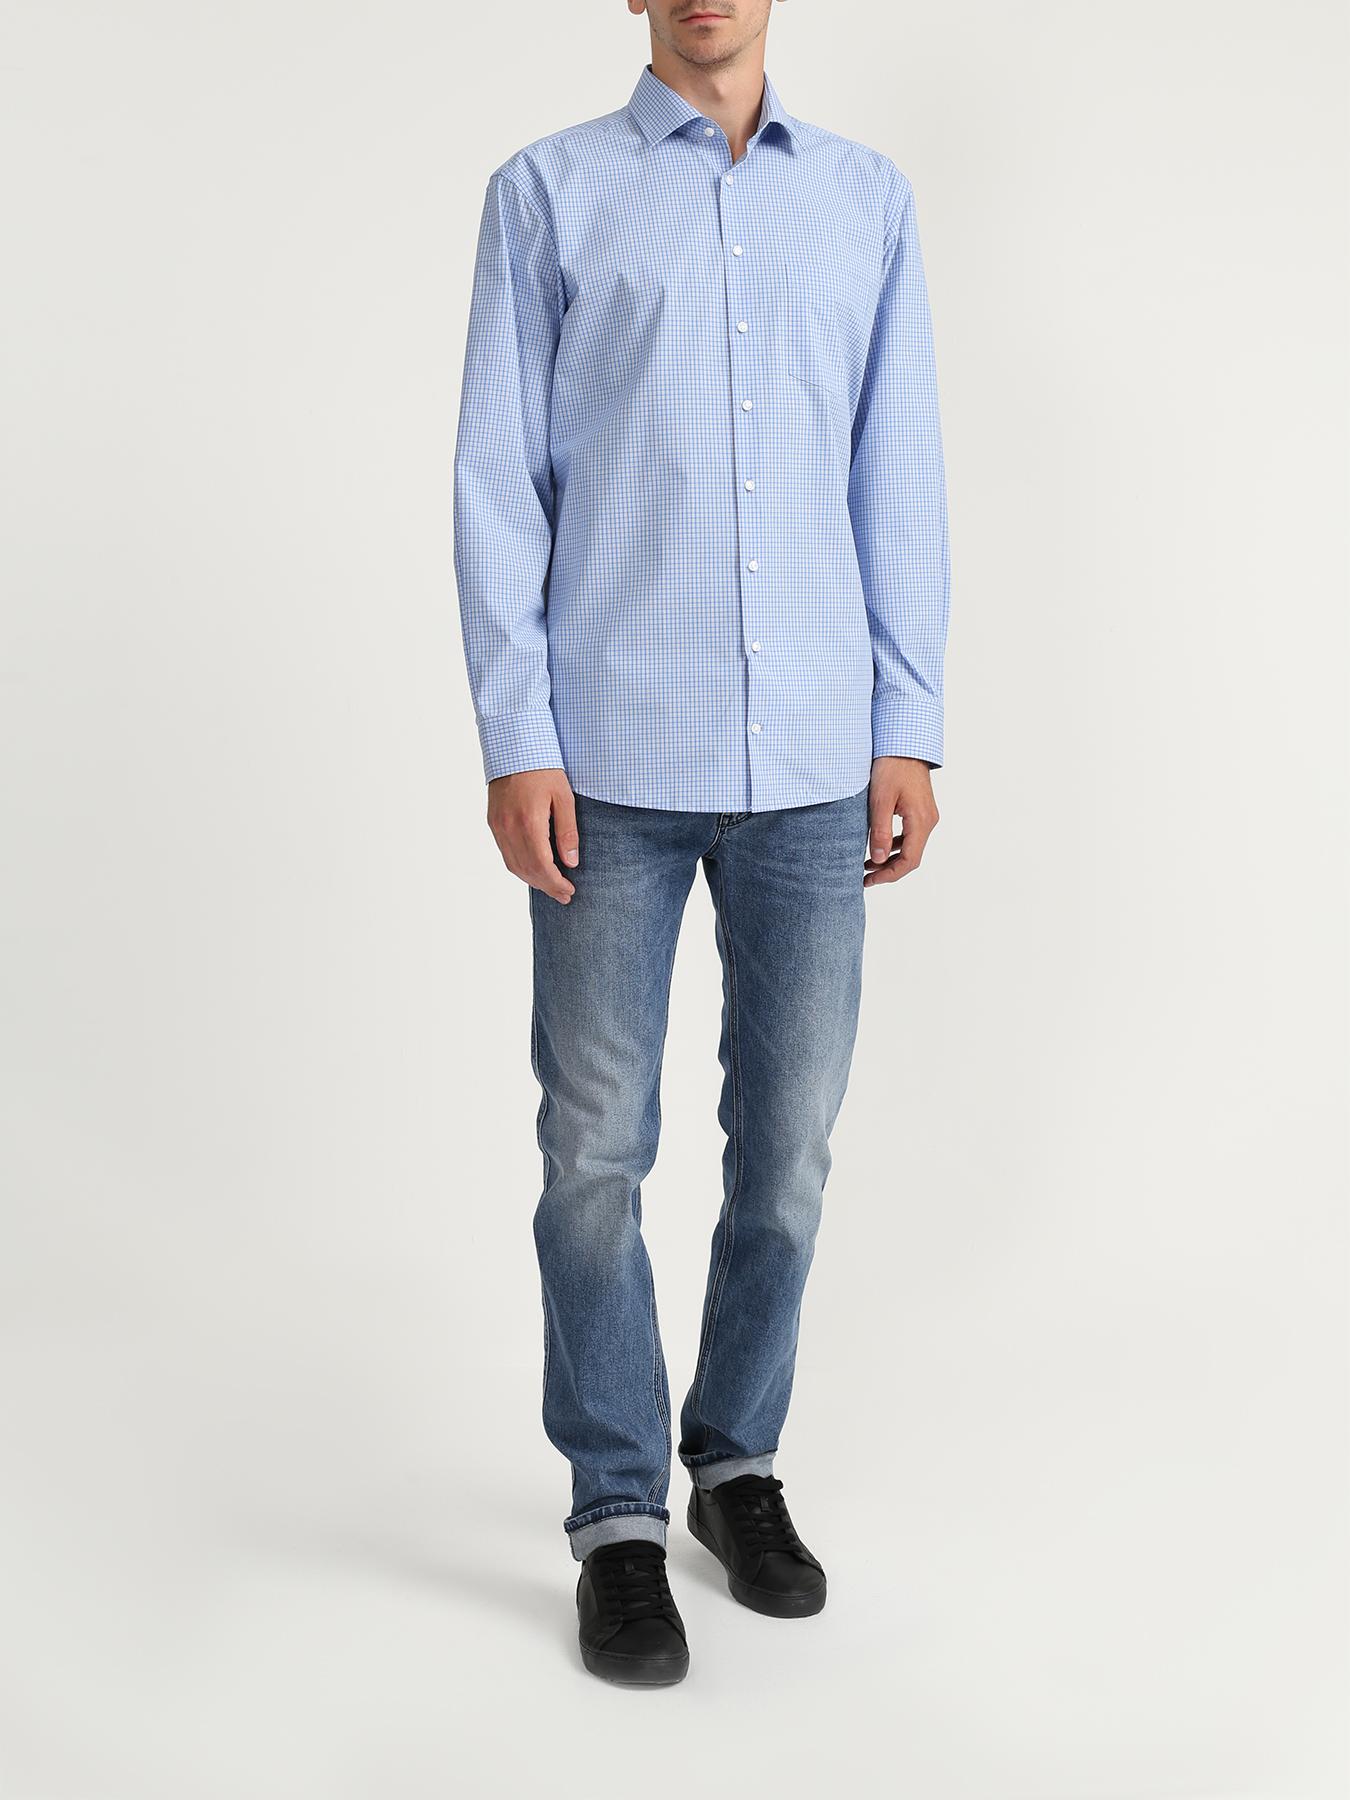 Рубашка Seidensticker Хлопковая рубашка в клетку